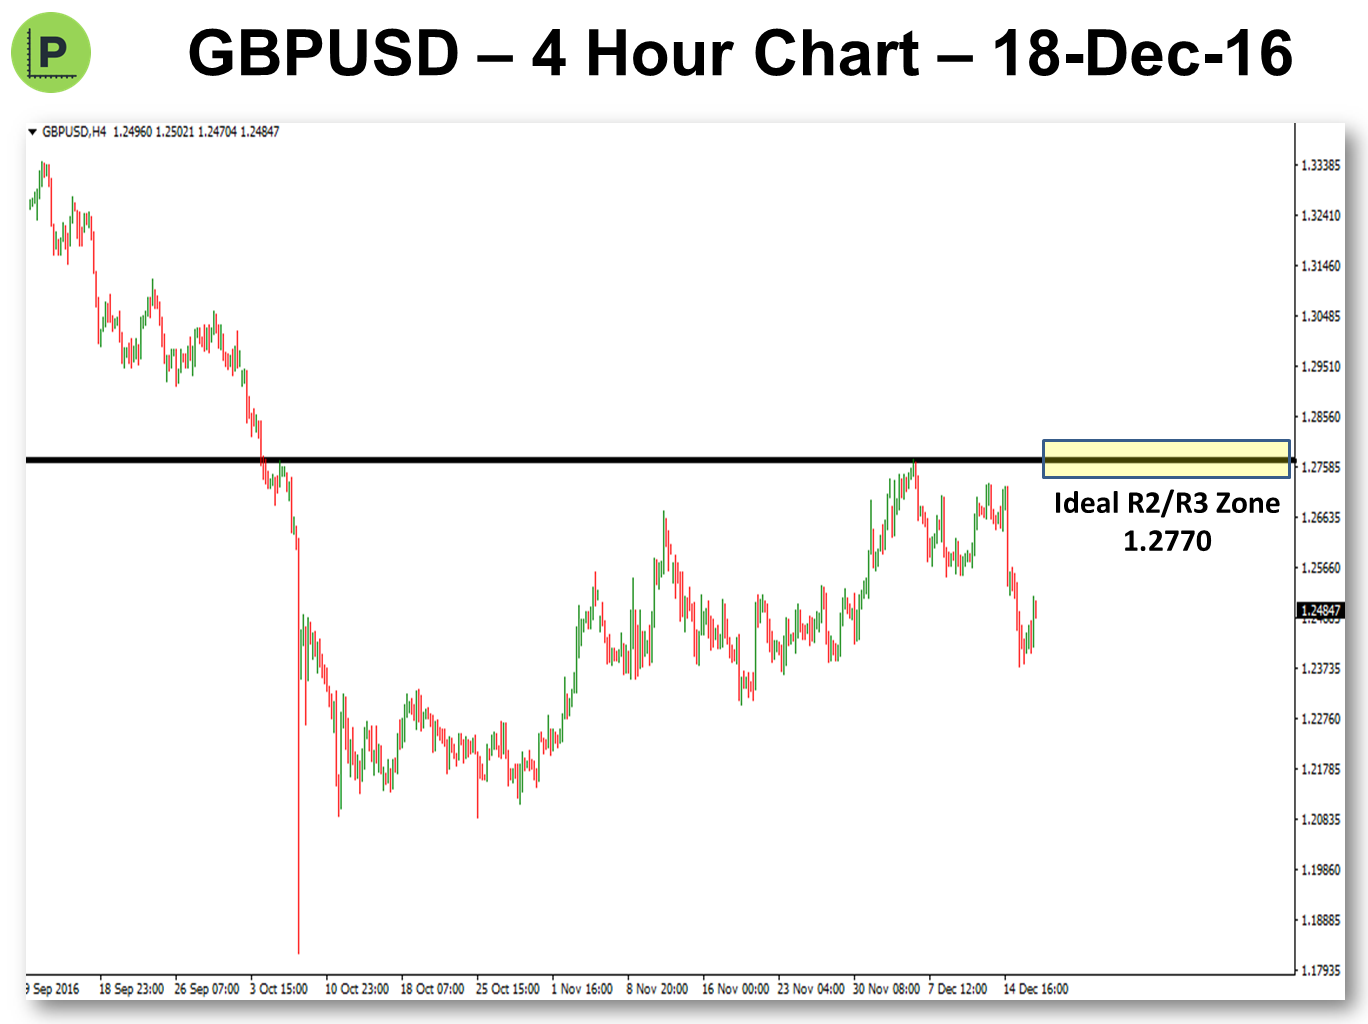 Potential Pivot Trade - 19-Dec-16 GBPUSD